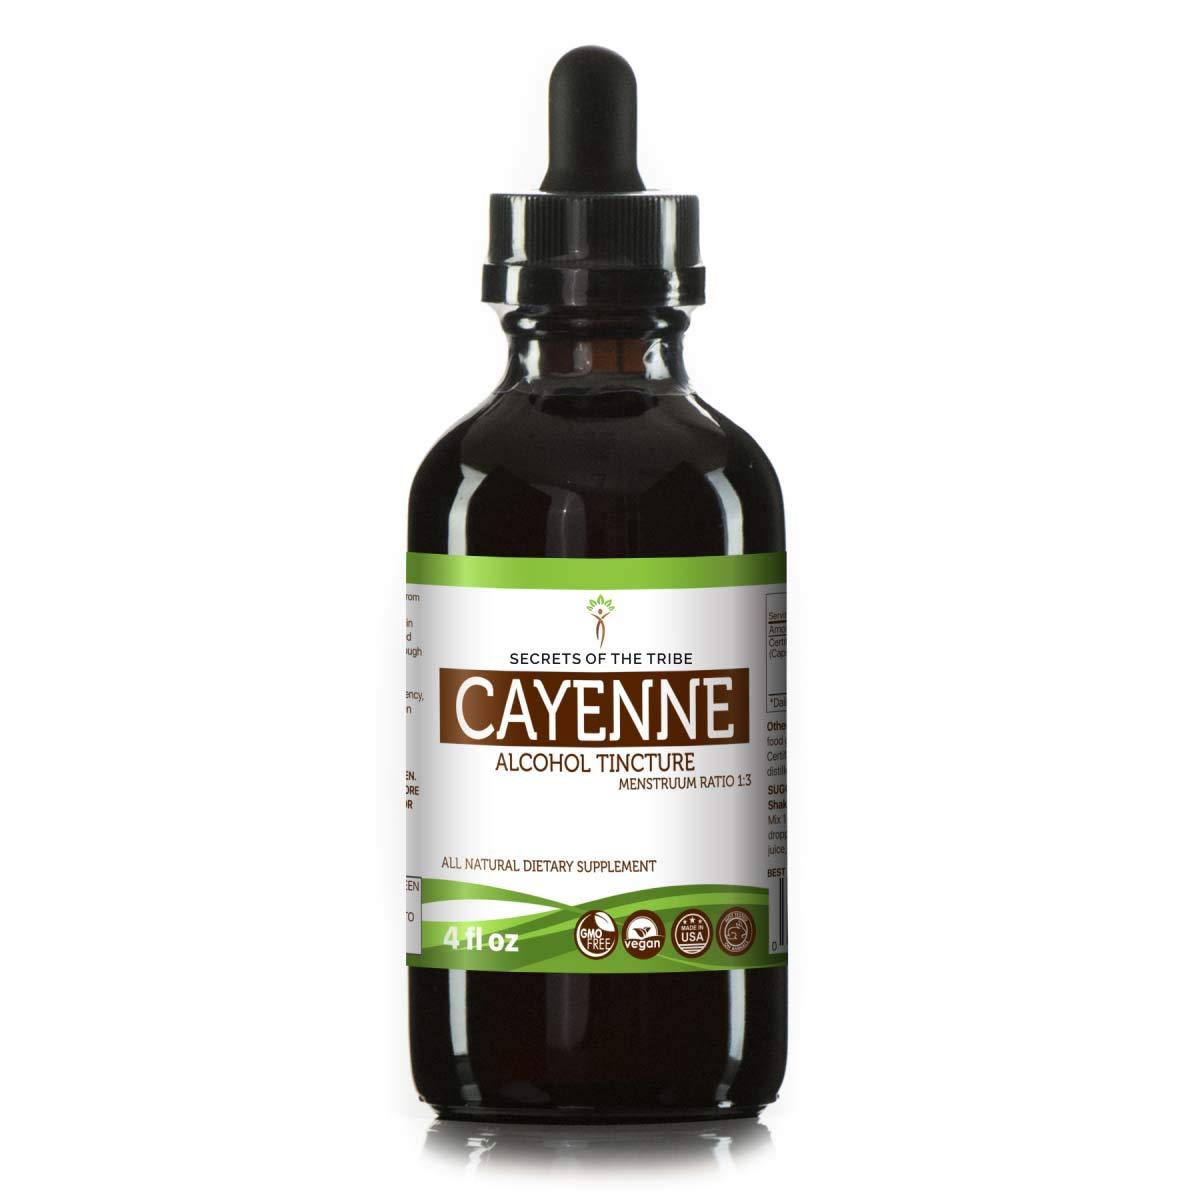 Cayenne Tincture Alcohol Extract, Organic Cayenne Capsicum annuum Invigorating Effect 4 OZ